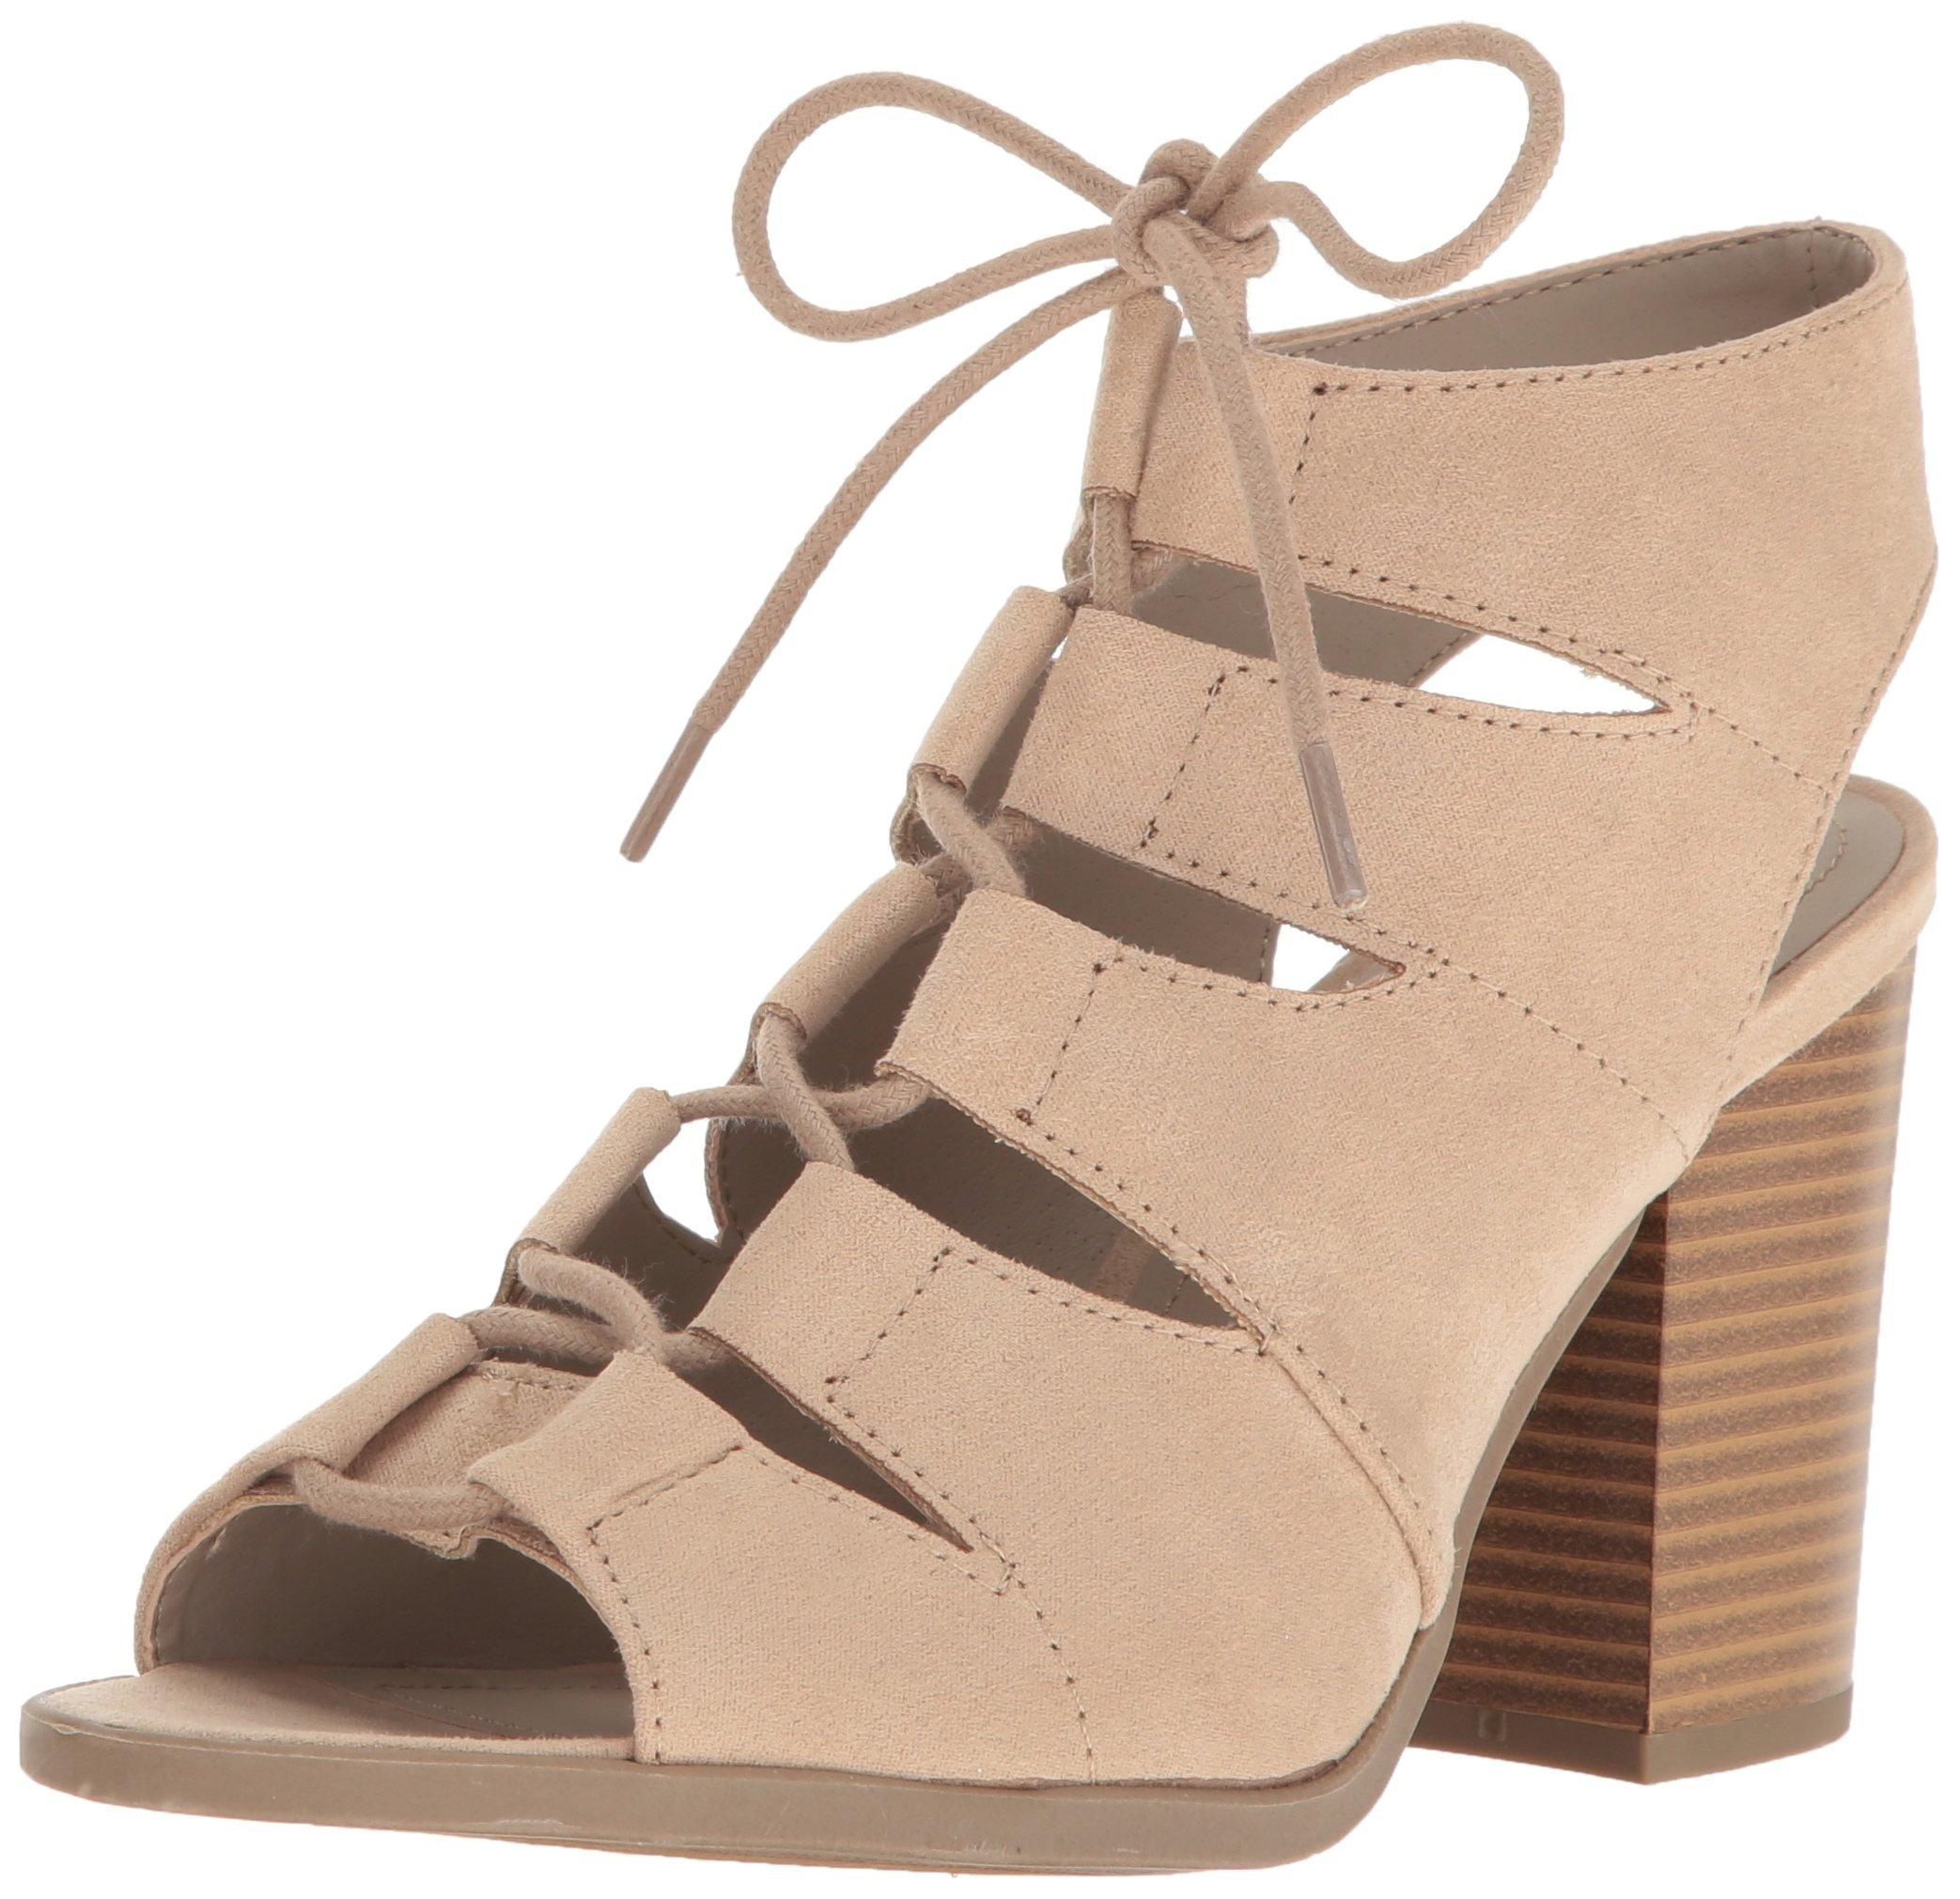 6e612d36b80e Best Rated in Women s Heeled Sandals   Helpful Customer Reviews ...